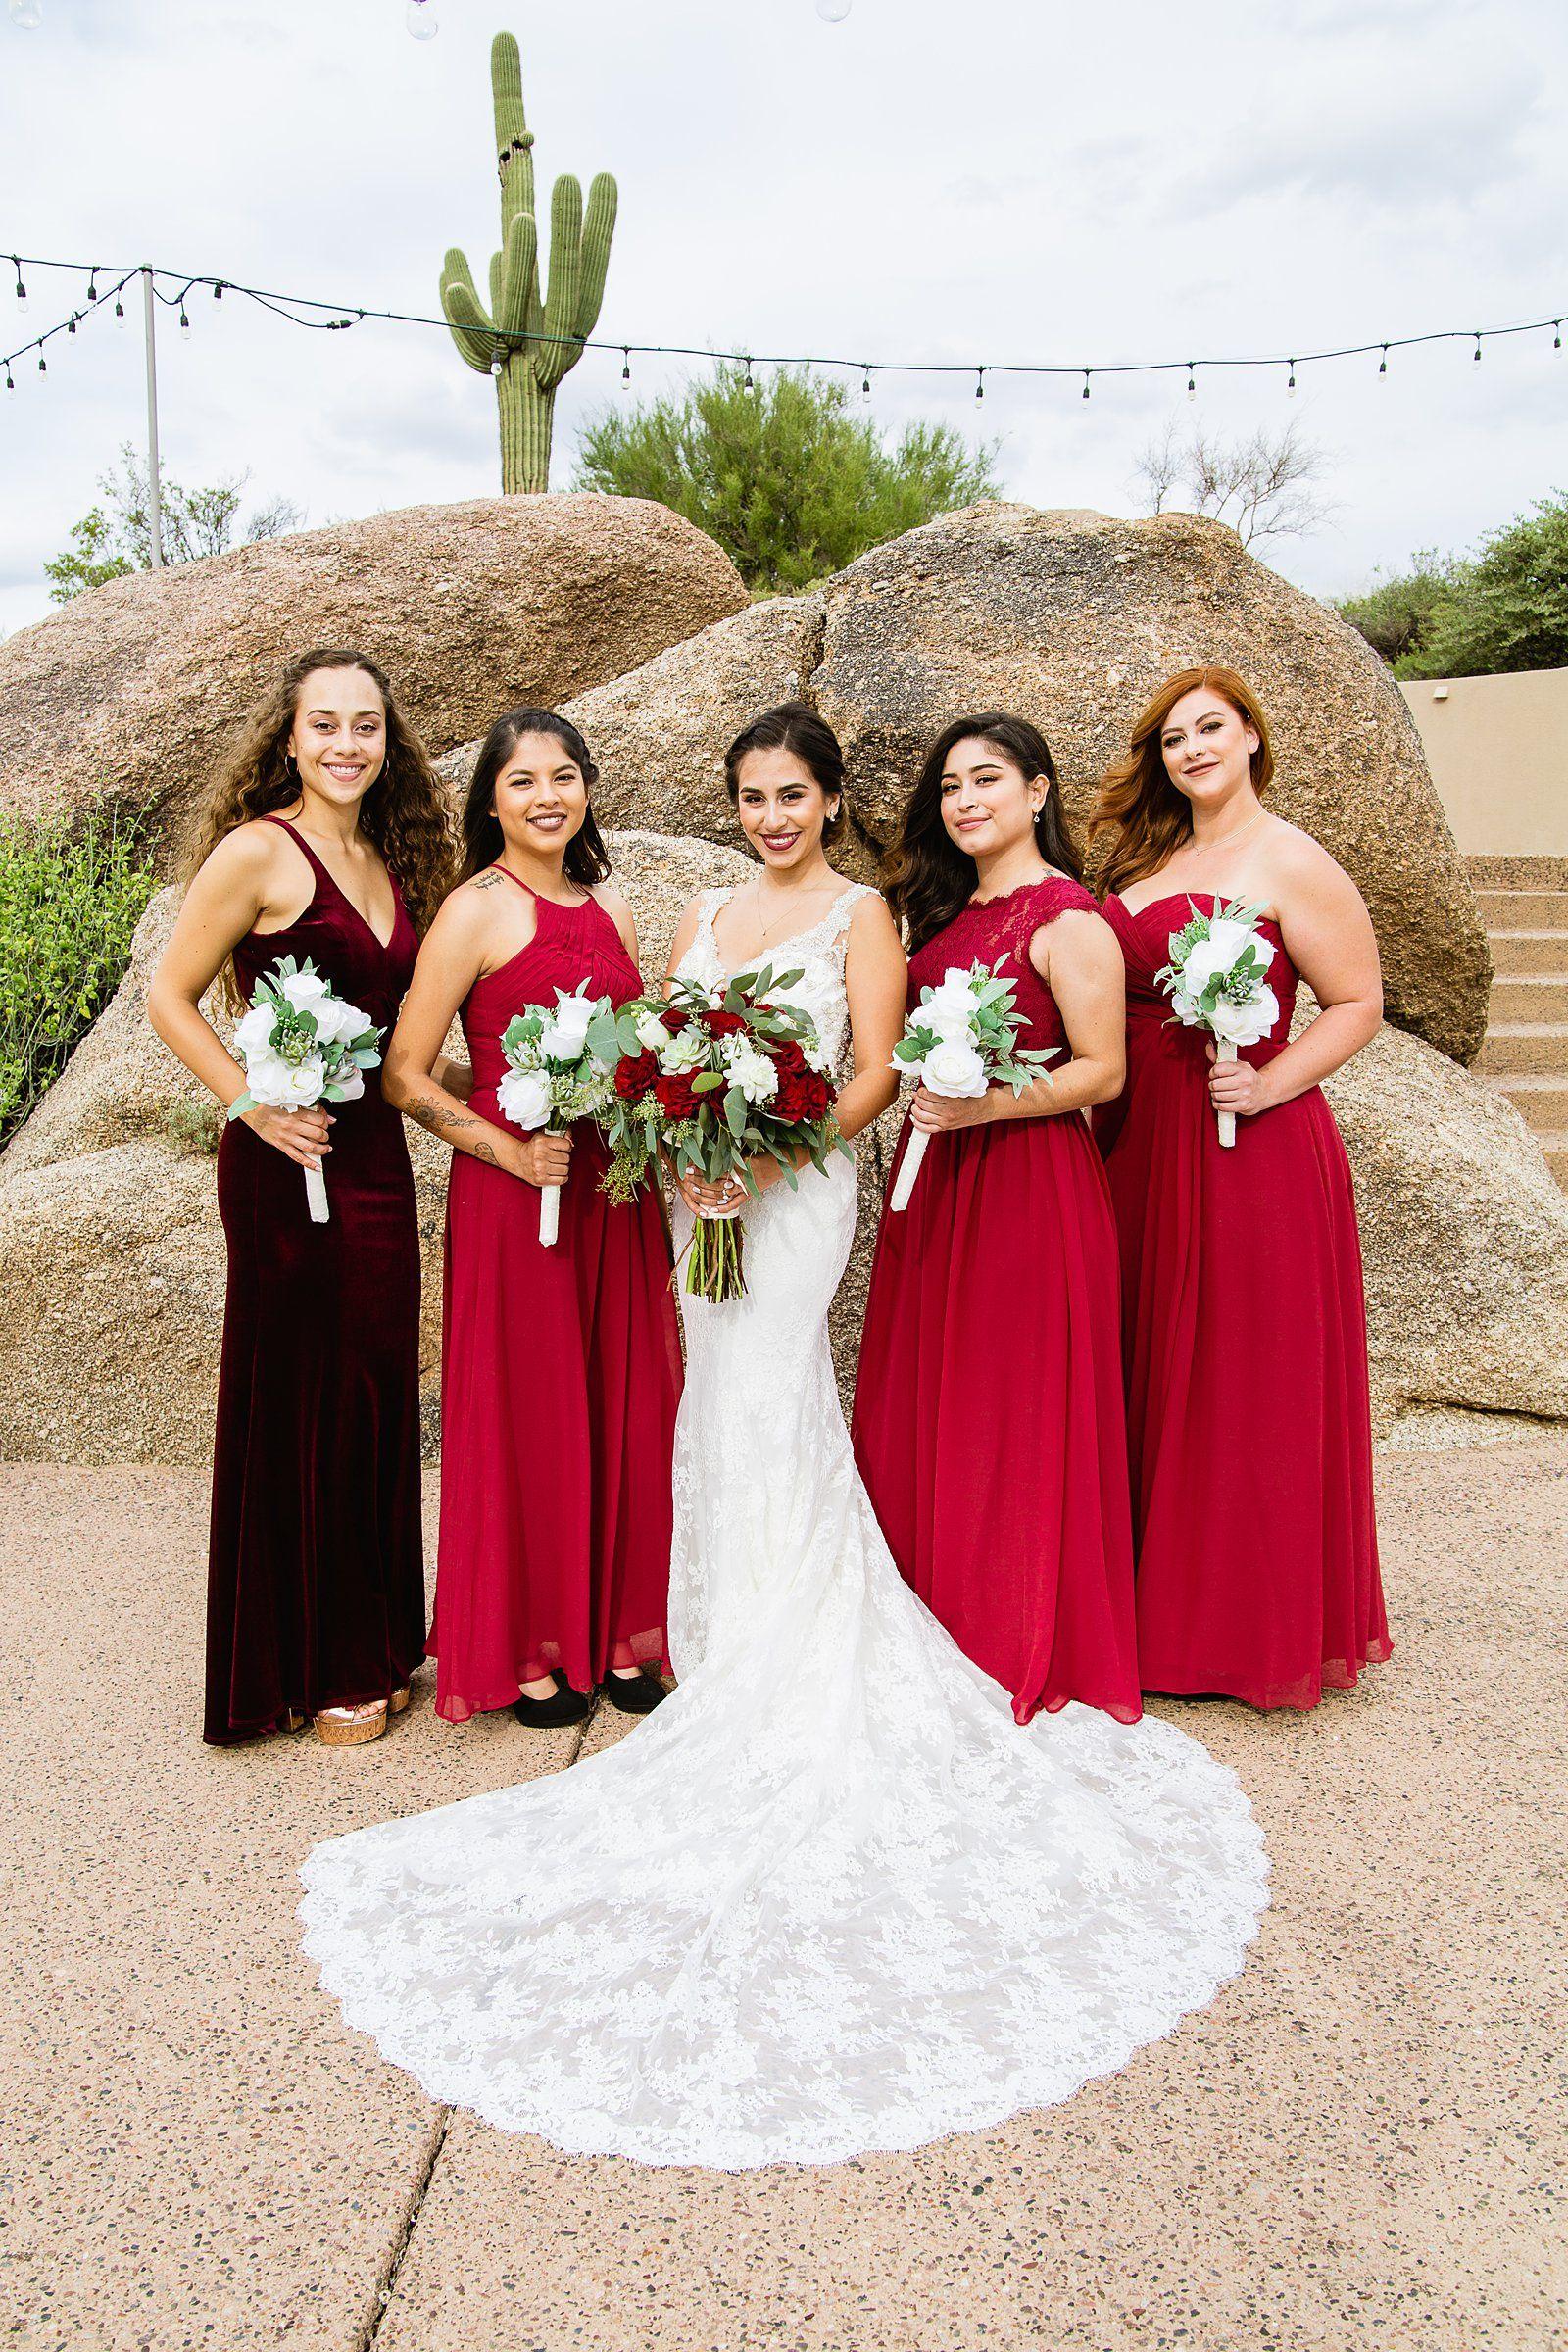 Dress for wedding party female  Troon North Wedding  PMA Weddings  Pinterest  Wedding Arizona